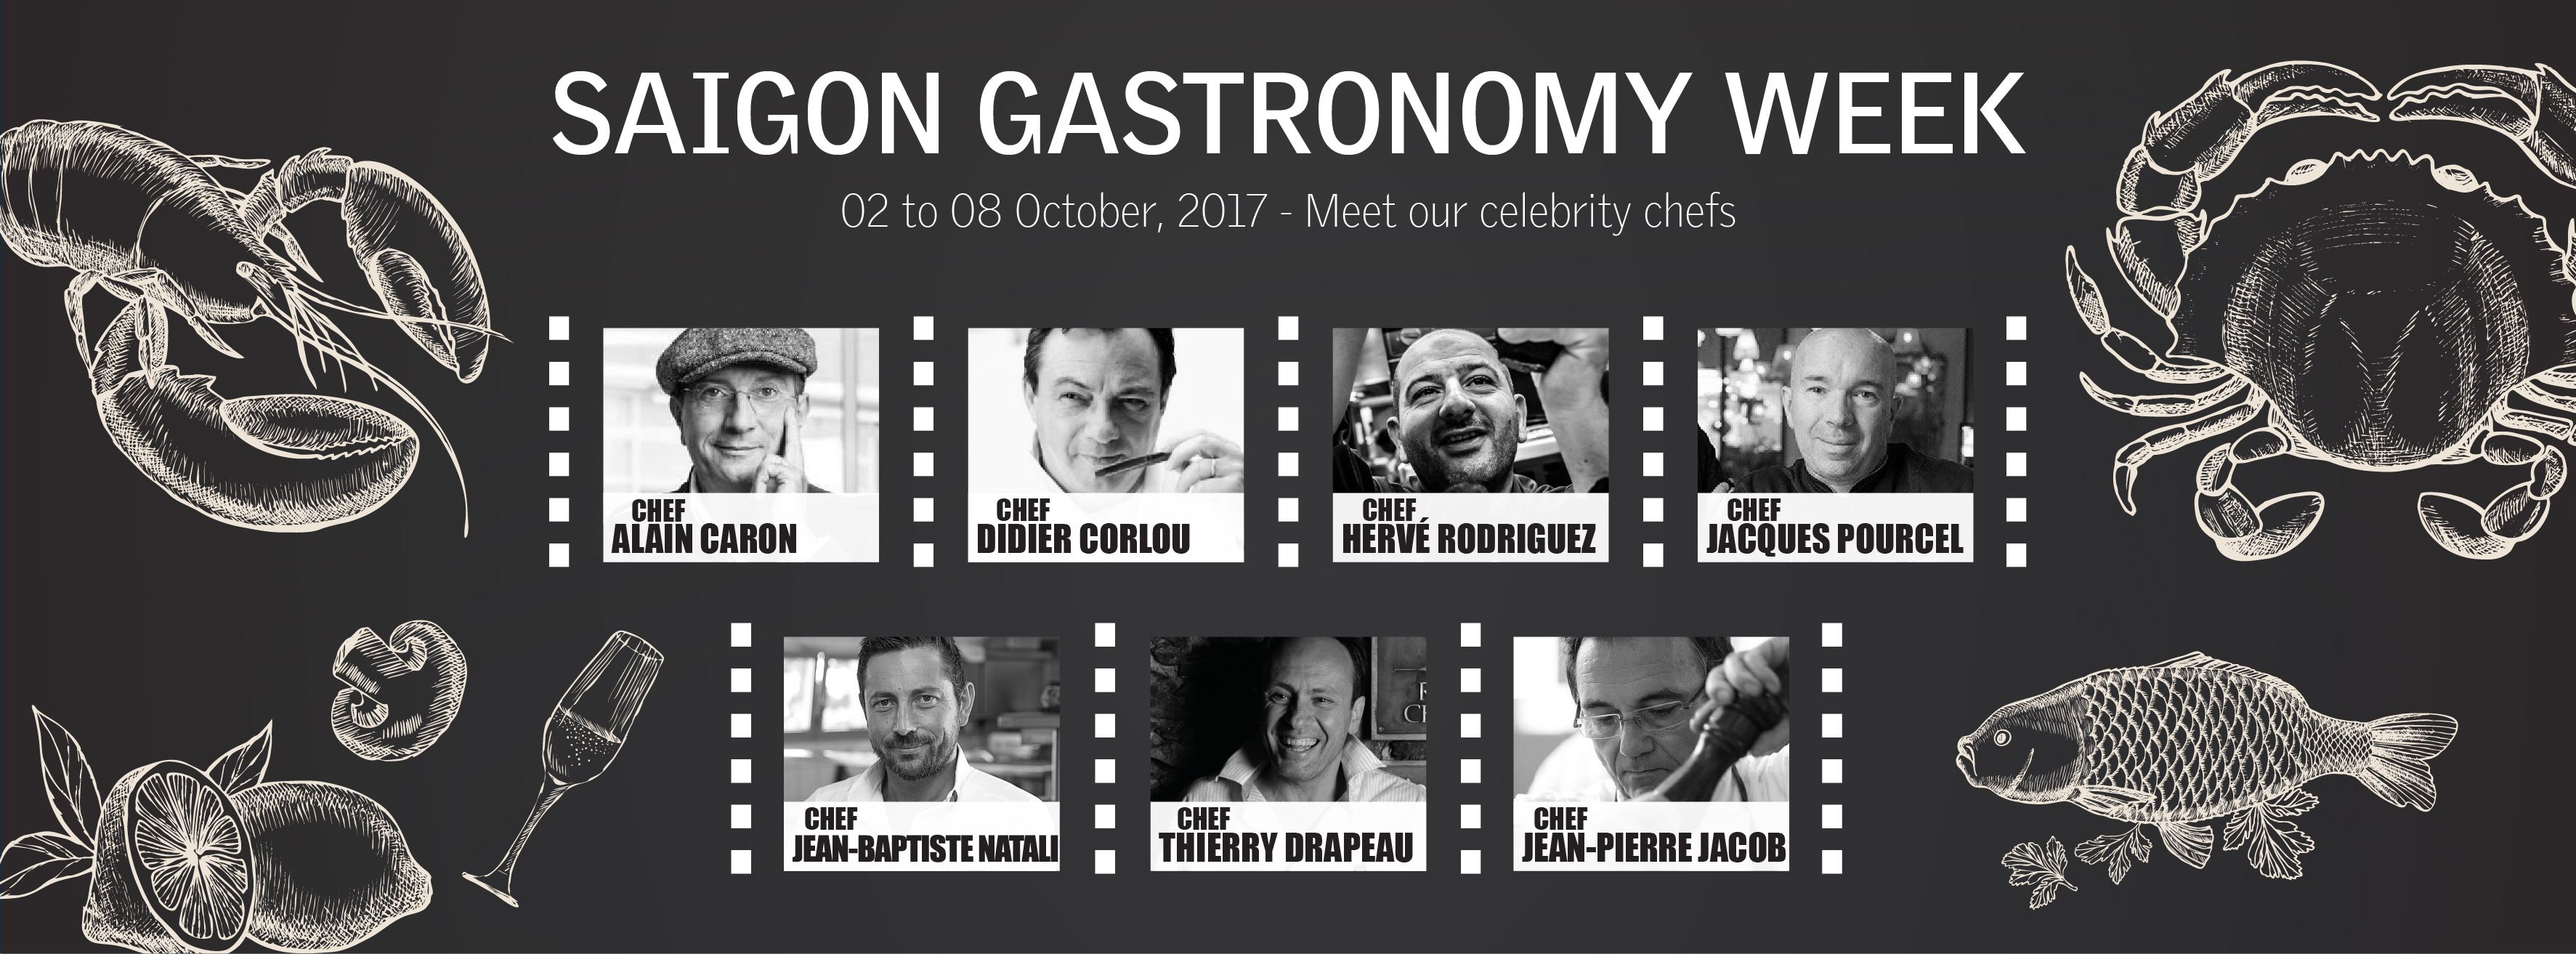 saigon gastronomy week 03